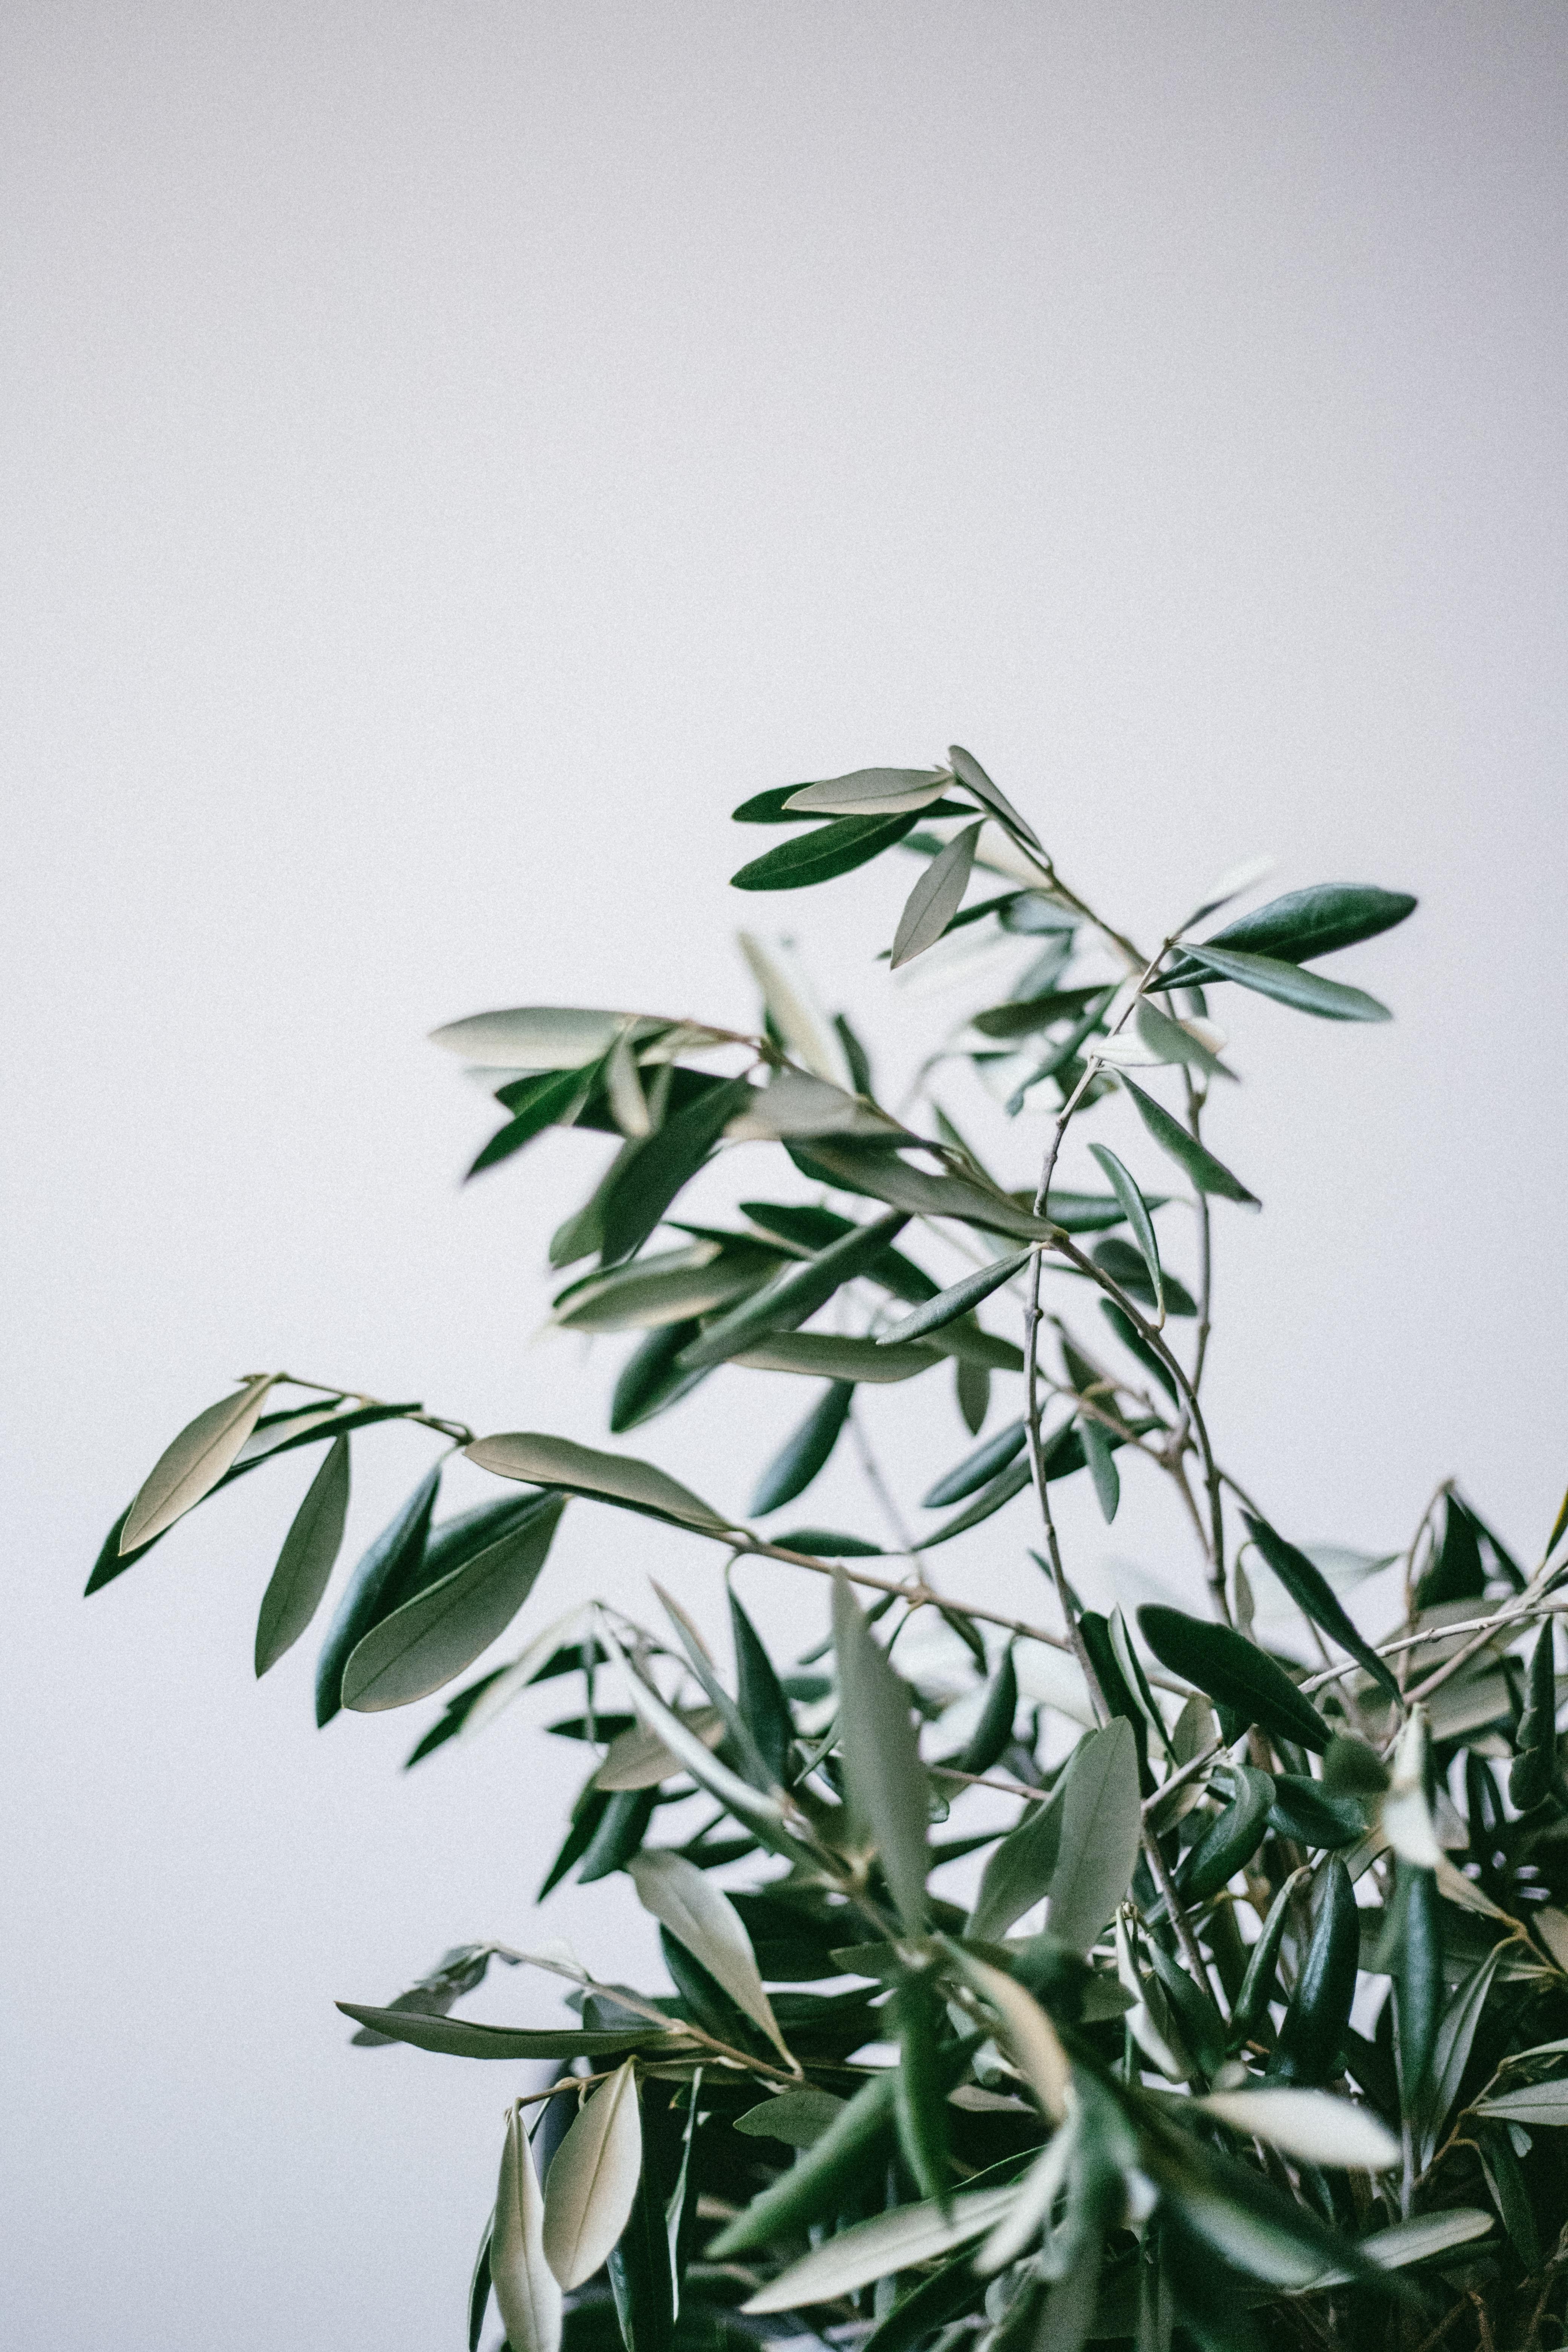 Olive Branch Pictures Download Free Images On Unsplash